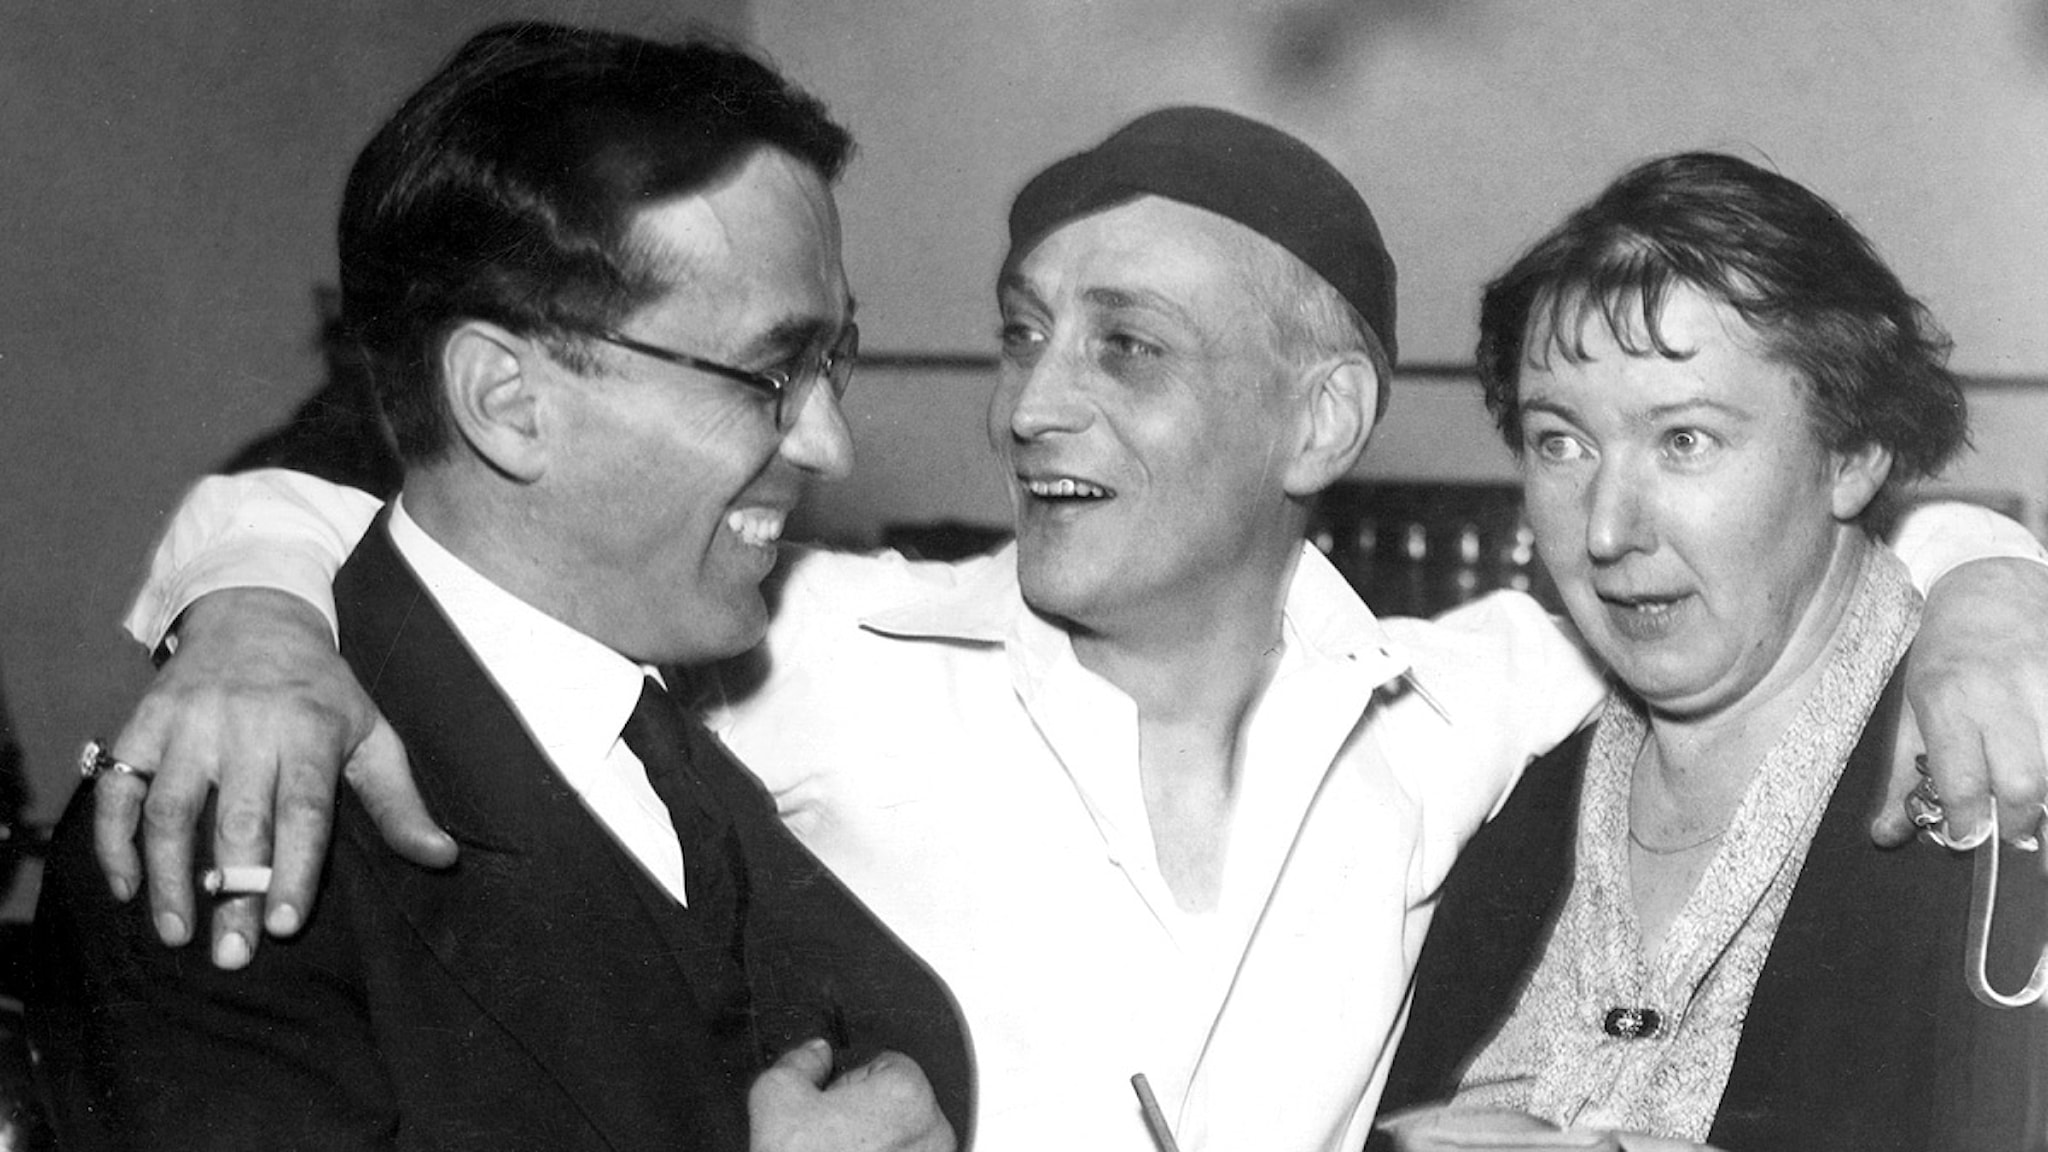 Gösta Ekman d.ä. firar med regissören Georges Pitoeff och Stina Bergman.